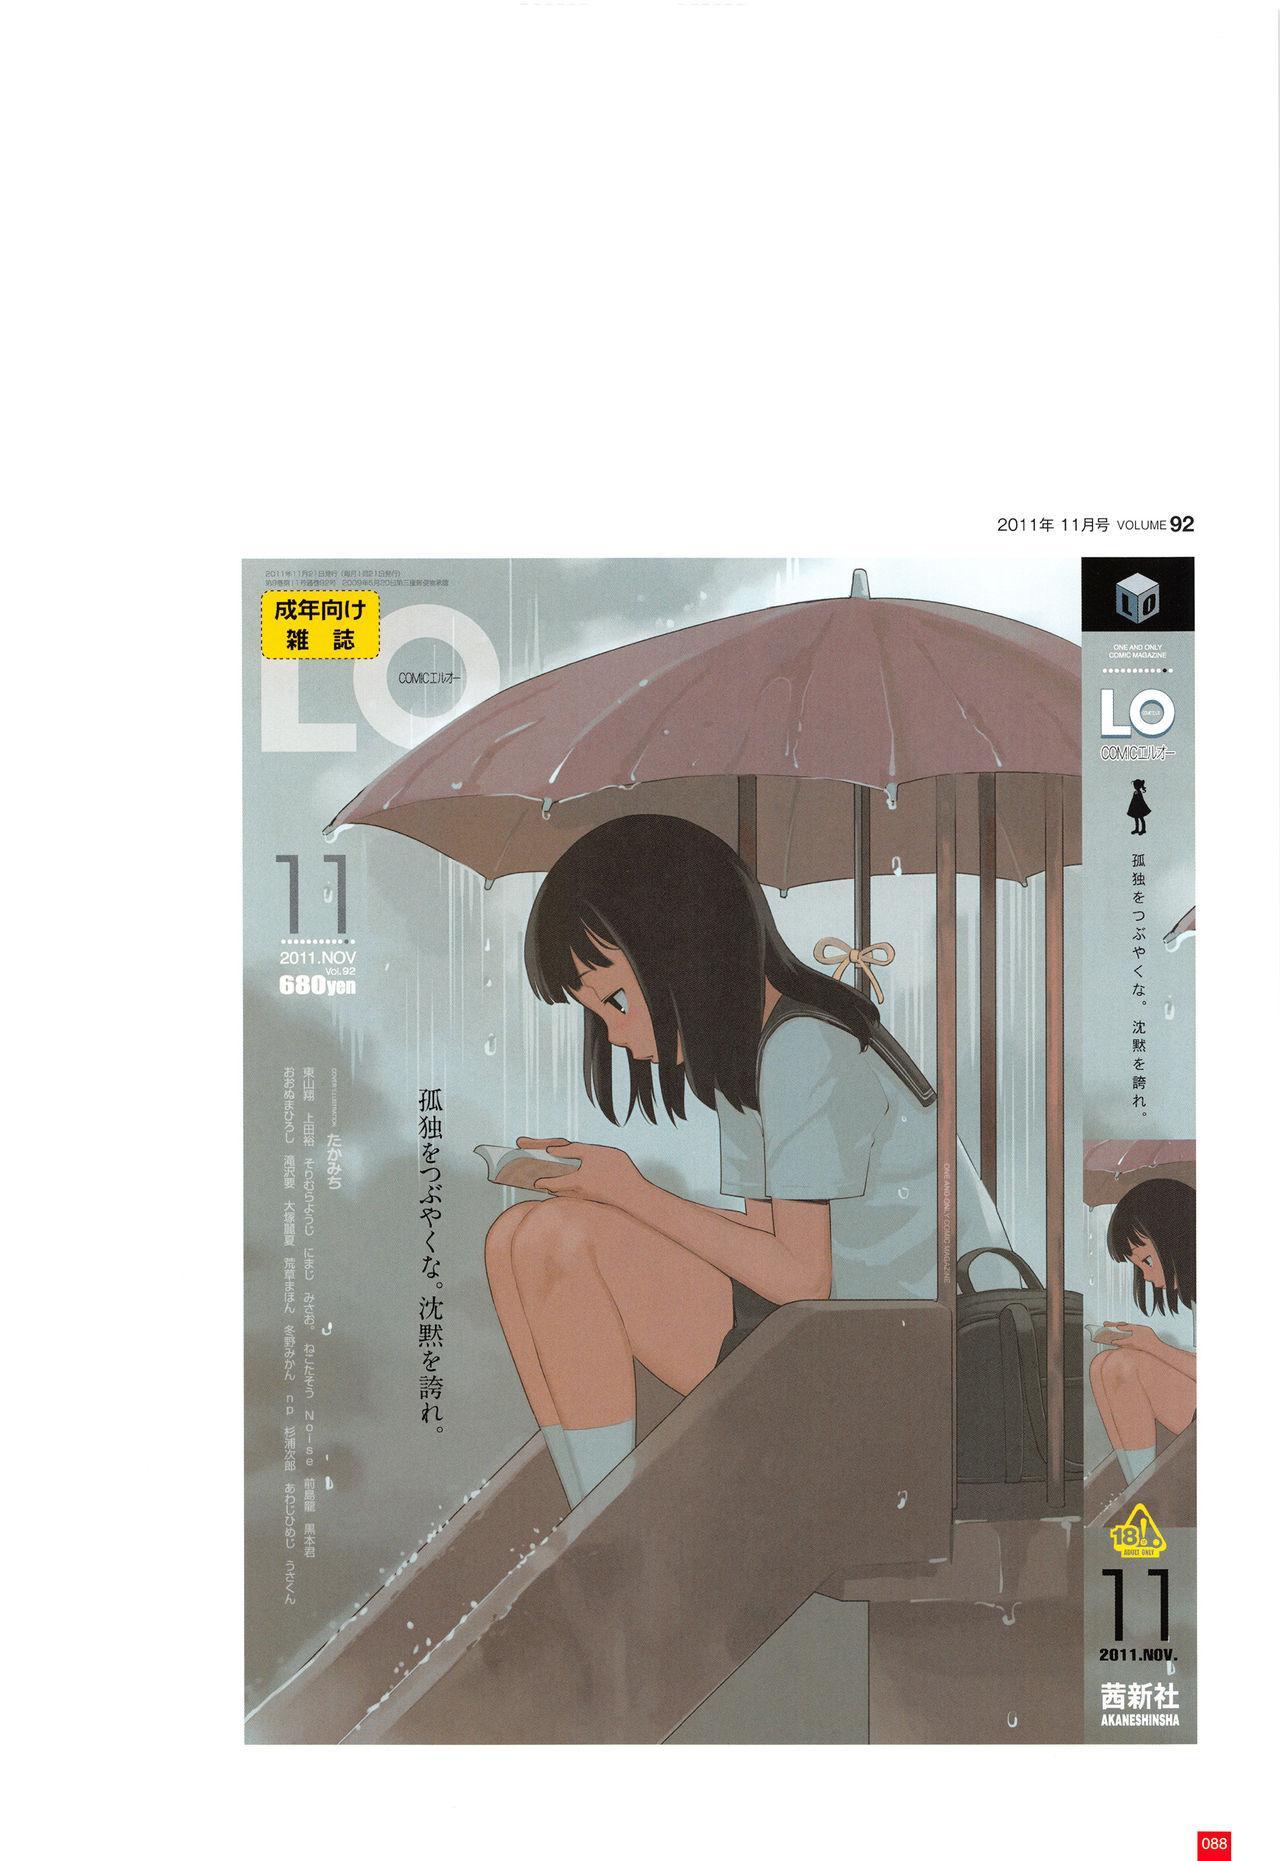 LO Artbook 2-A TAKAMICHI LOOP WORKS 90